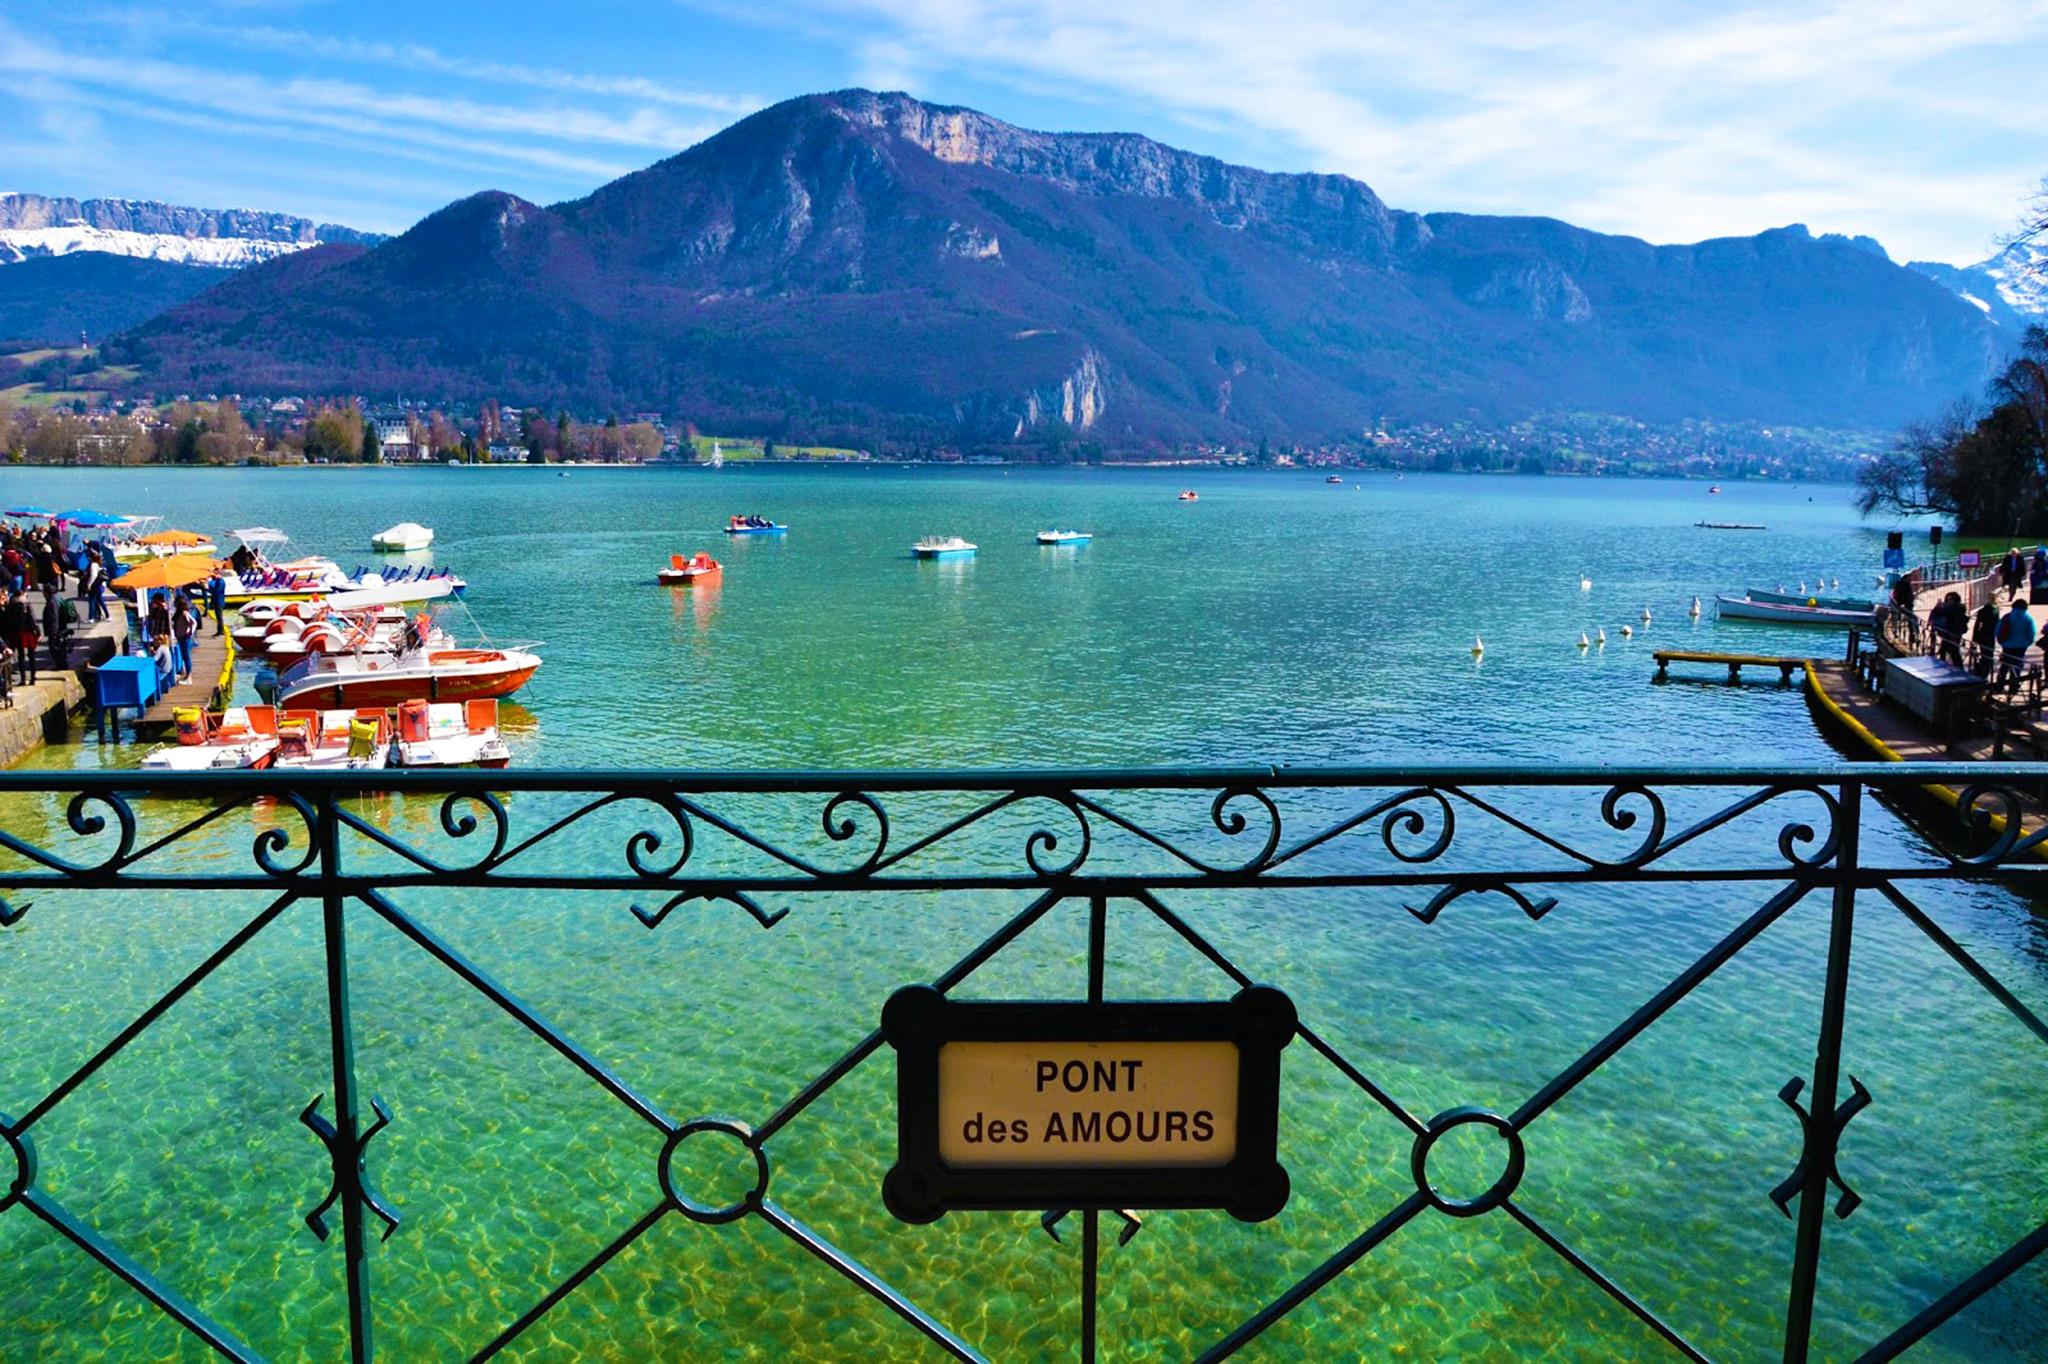 kt_2020_370_Keytours_excursions_Swisstours_annecy_pont_des_amours2_2048_10